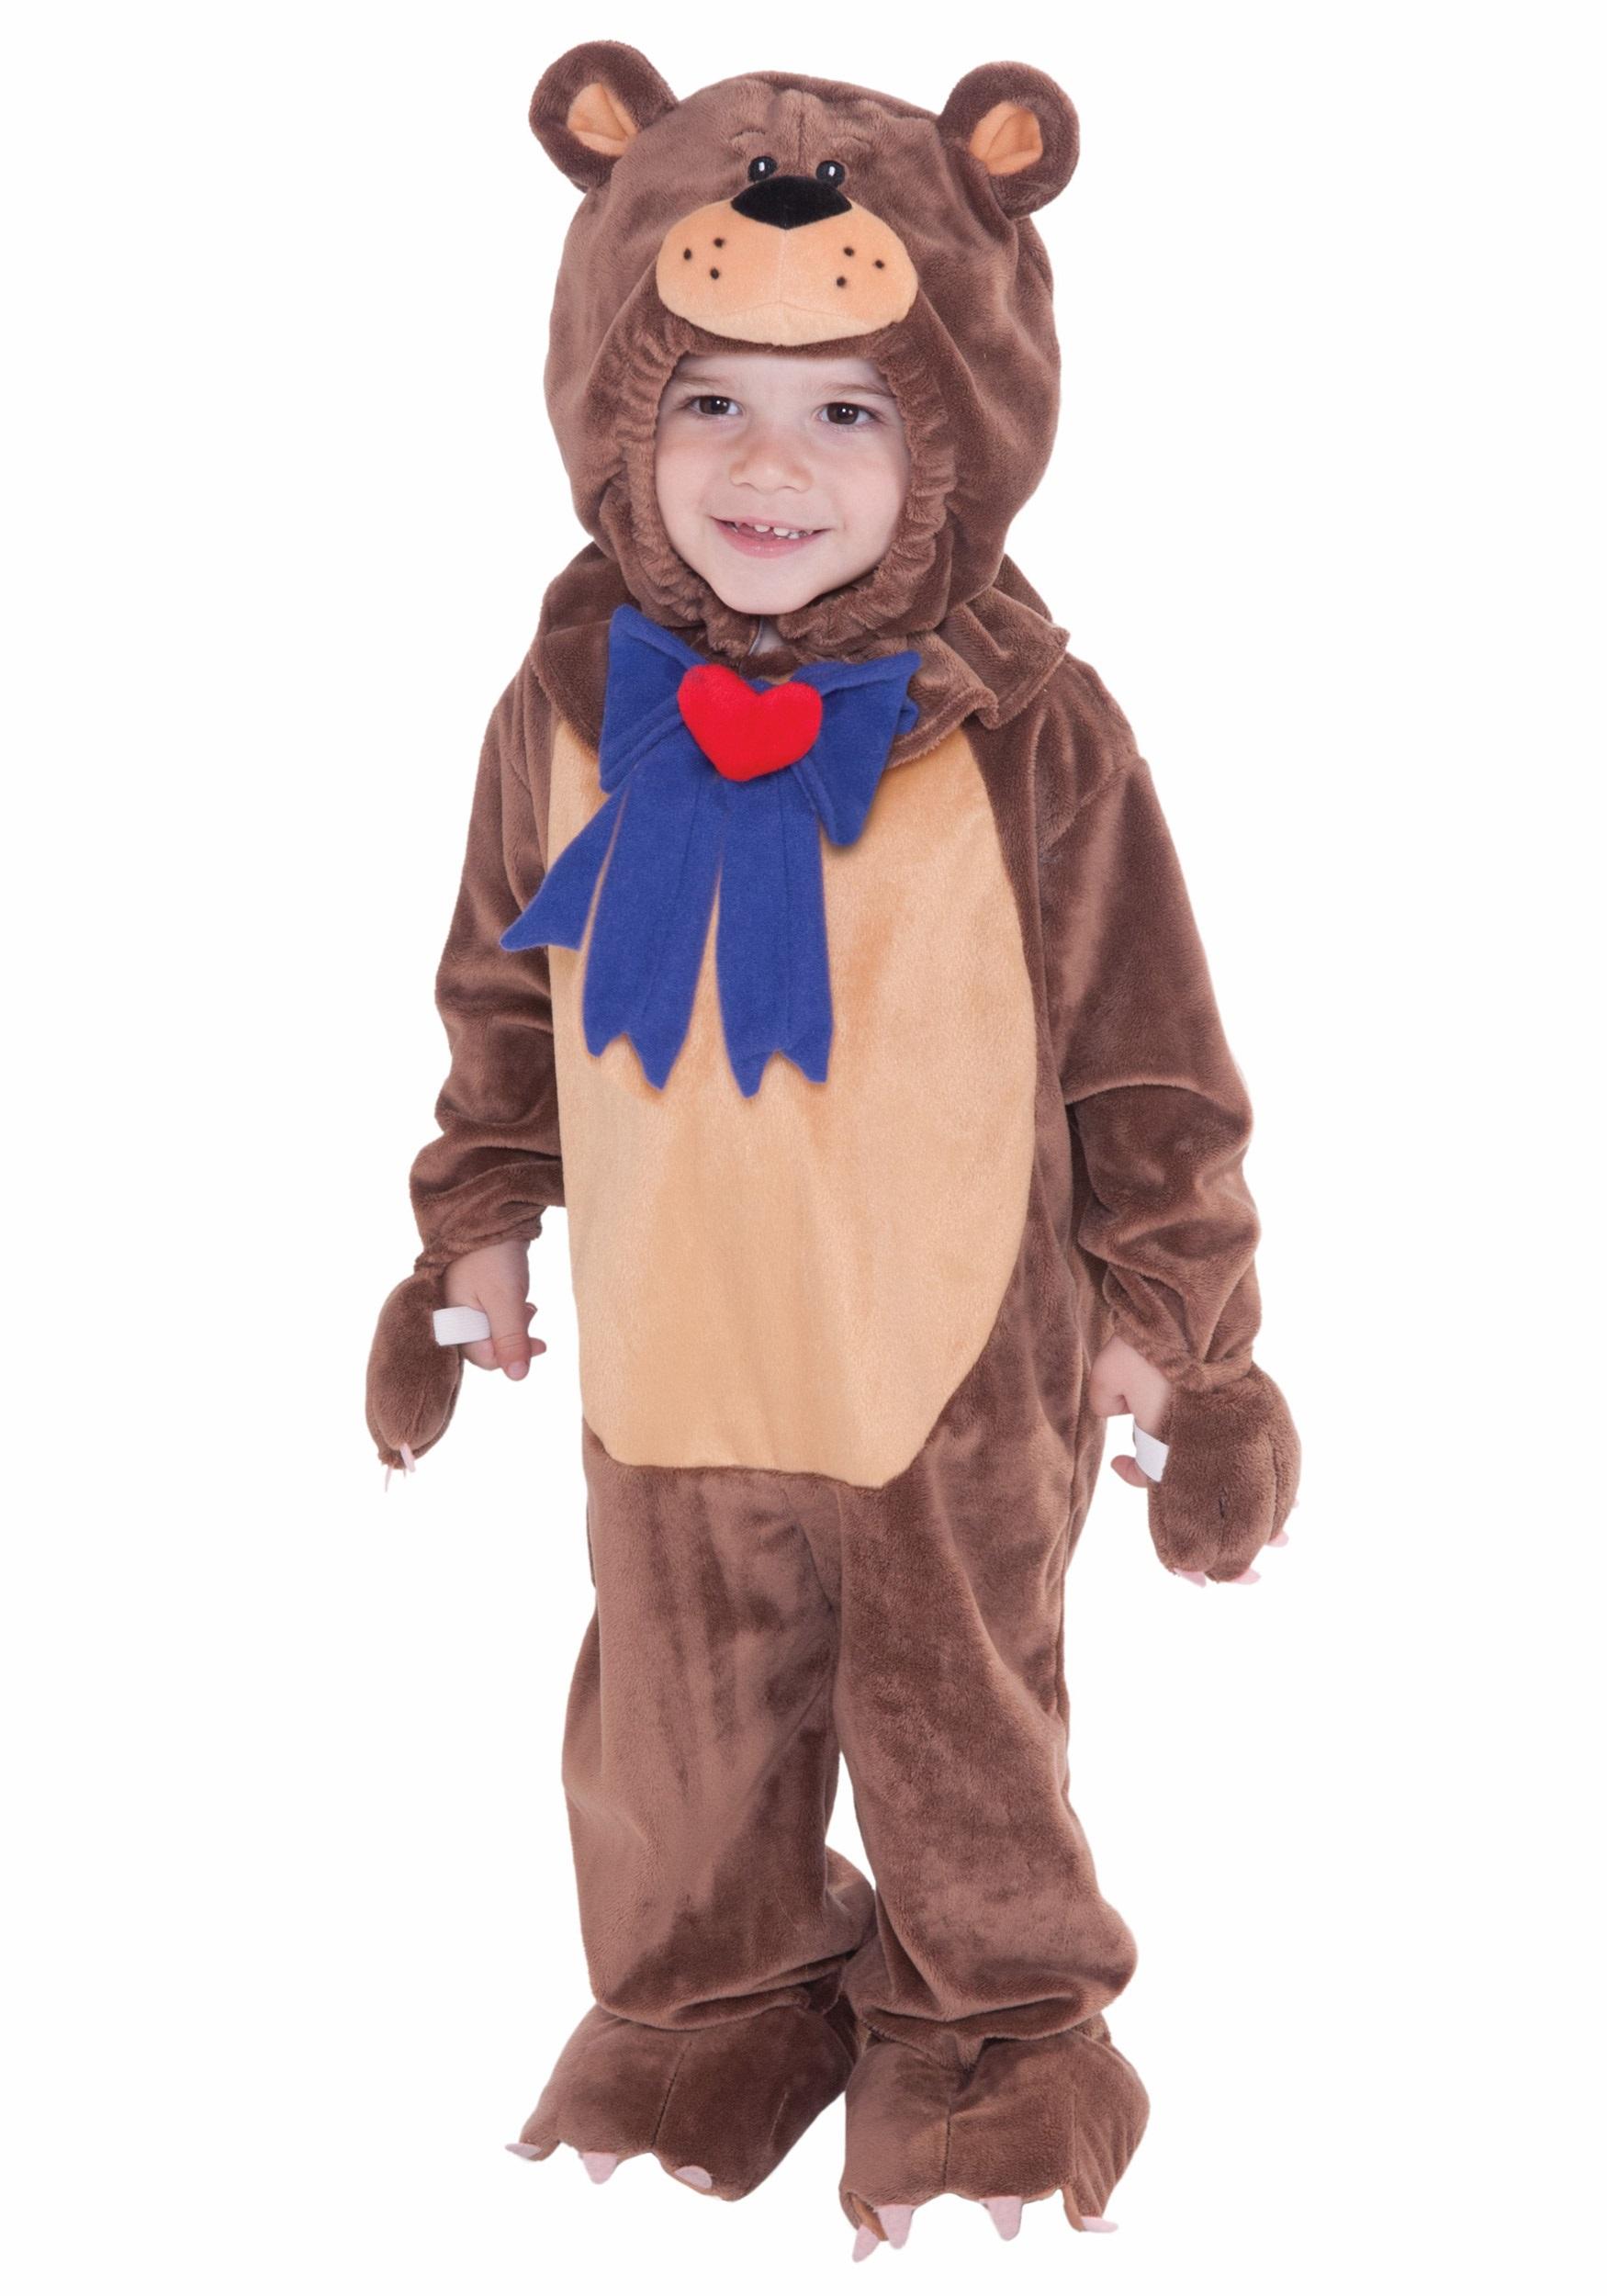 Teddy Bear Costumes Costumesfc Com